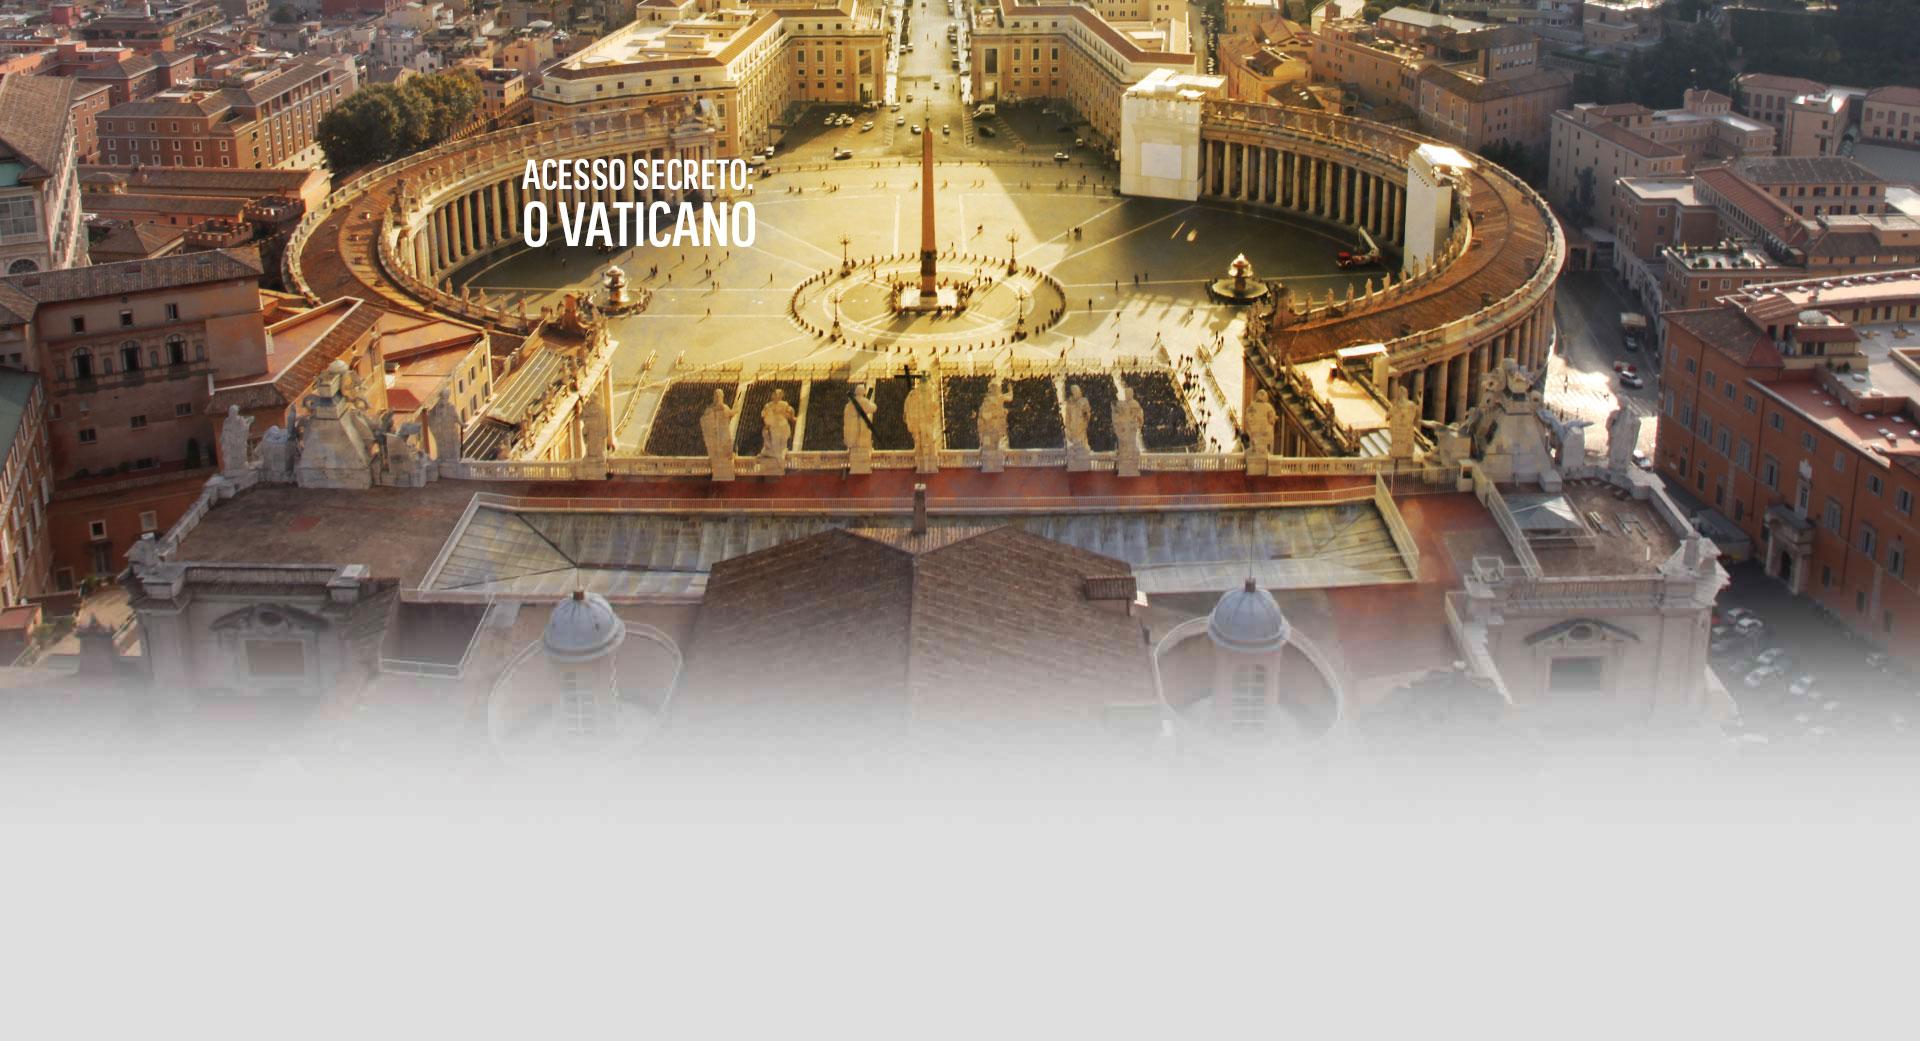 acesso secreto o vaticano